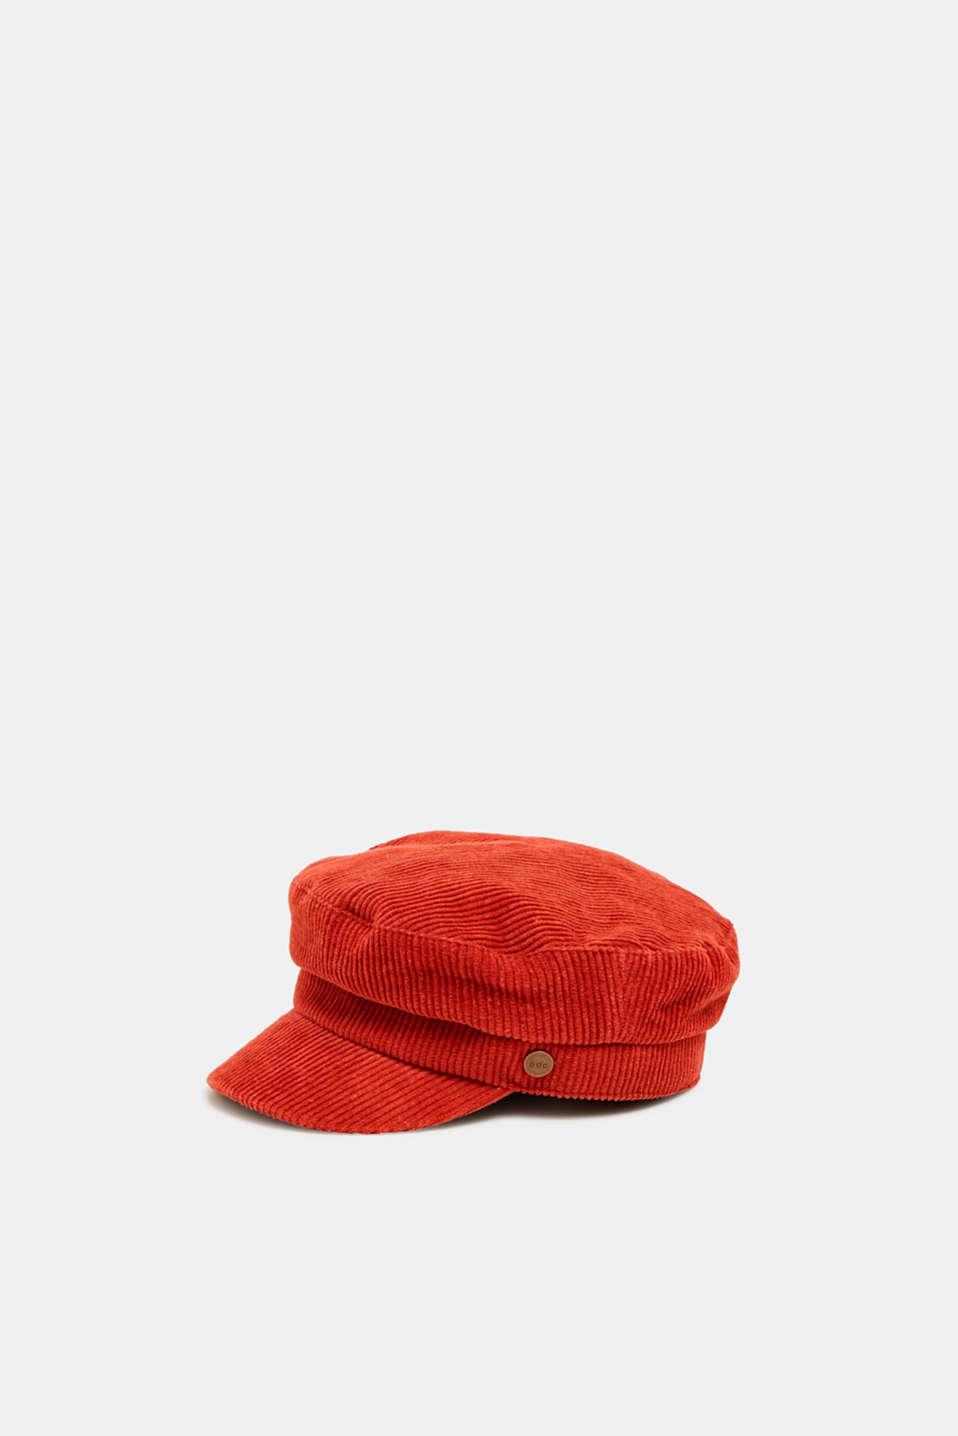 Corduroy sailor's cap